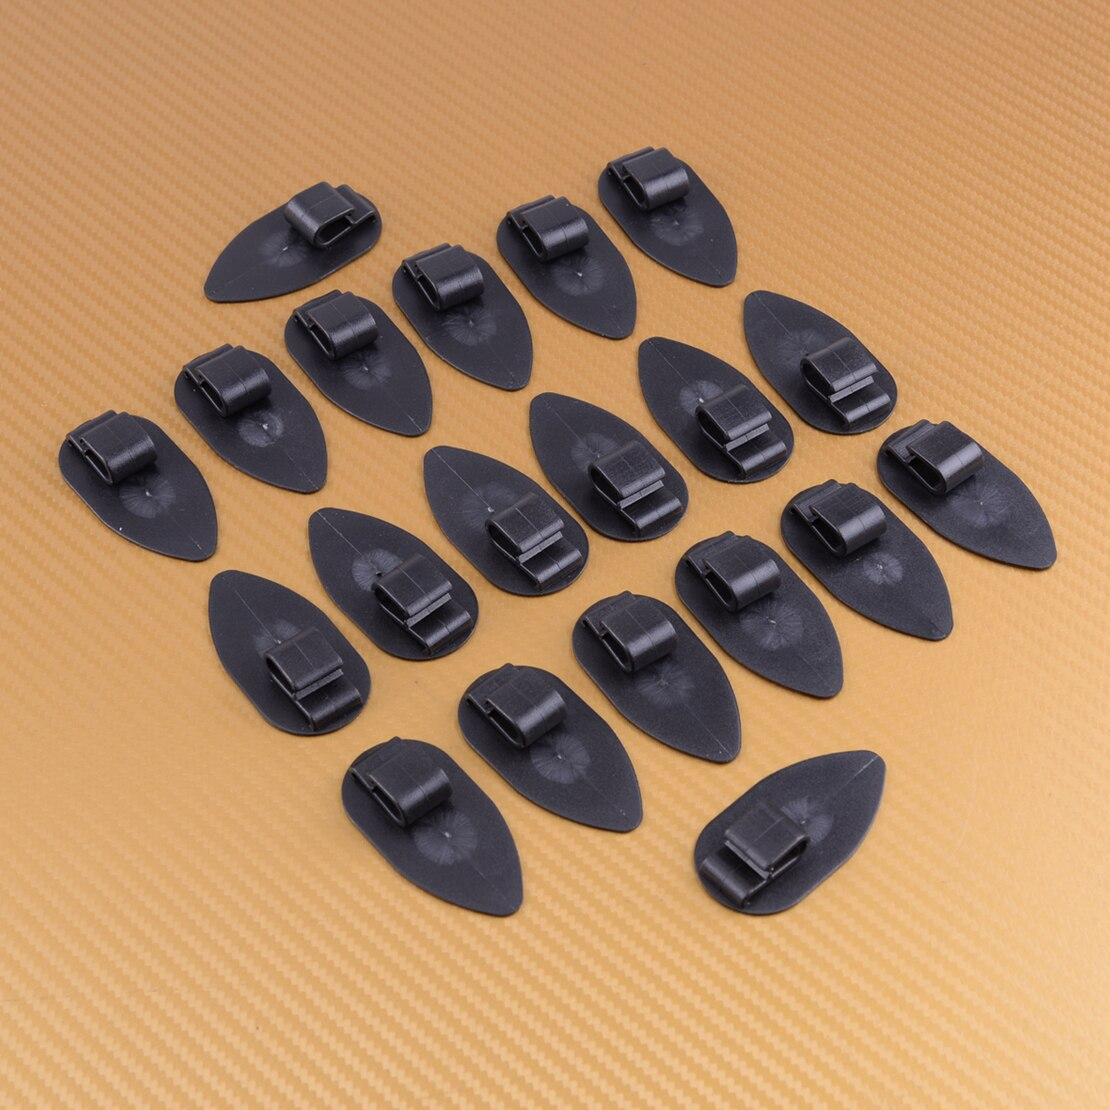 20 pcs 블랙 유니버설 플로어 트렁크 카펫 라이너 매트 리테이너 클립 슬라이딩 마운트